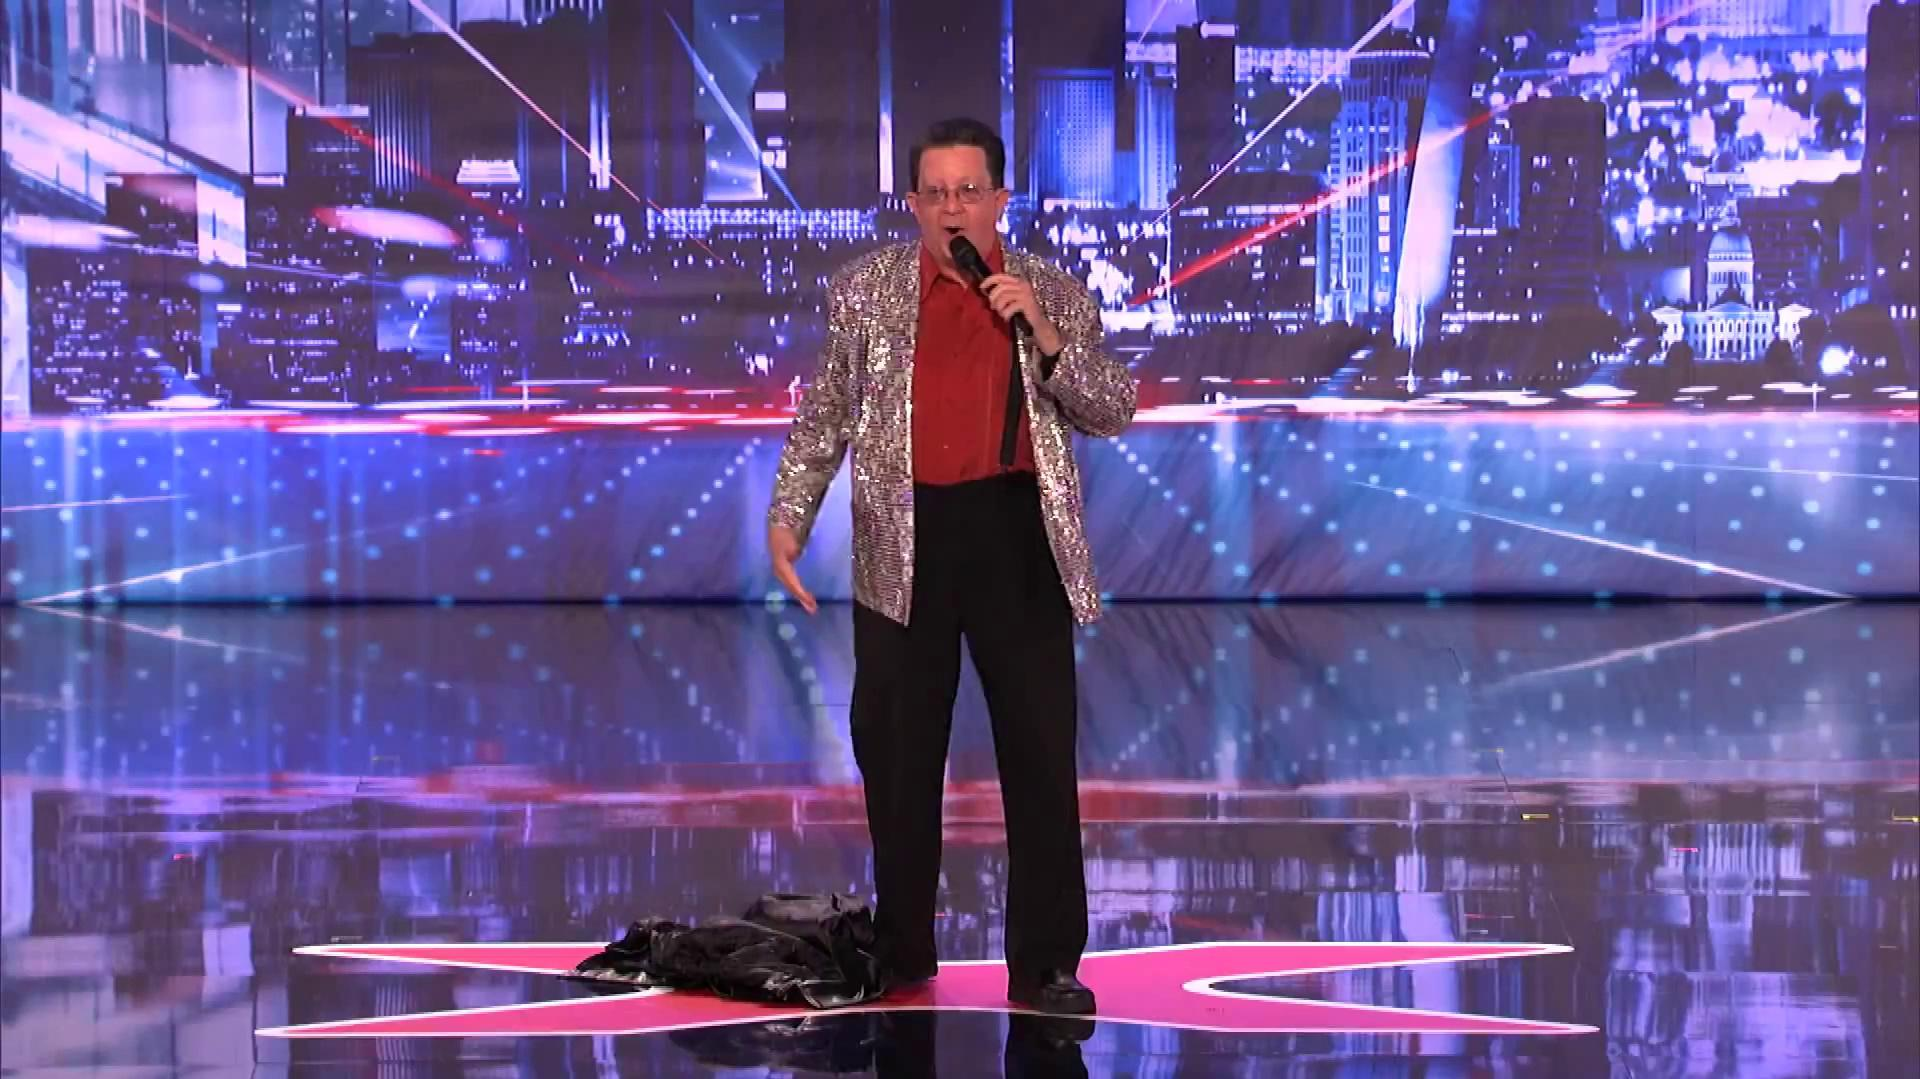 America's Got Talent 2013 - Season 8 - 114 - Perry Kurtz - Rap Song by 62-Year-Old Ex Male Stripper